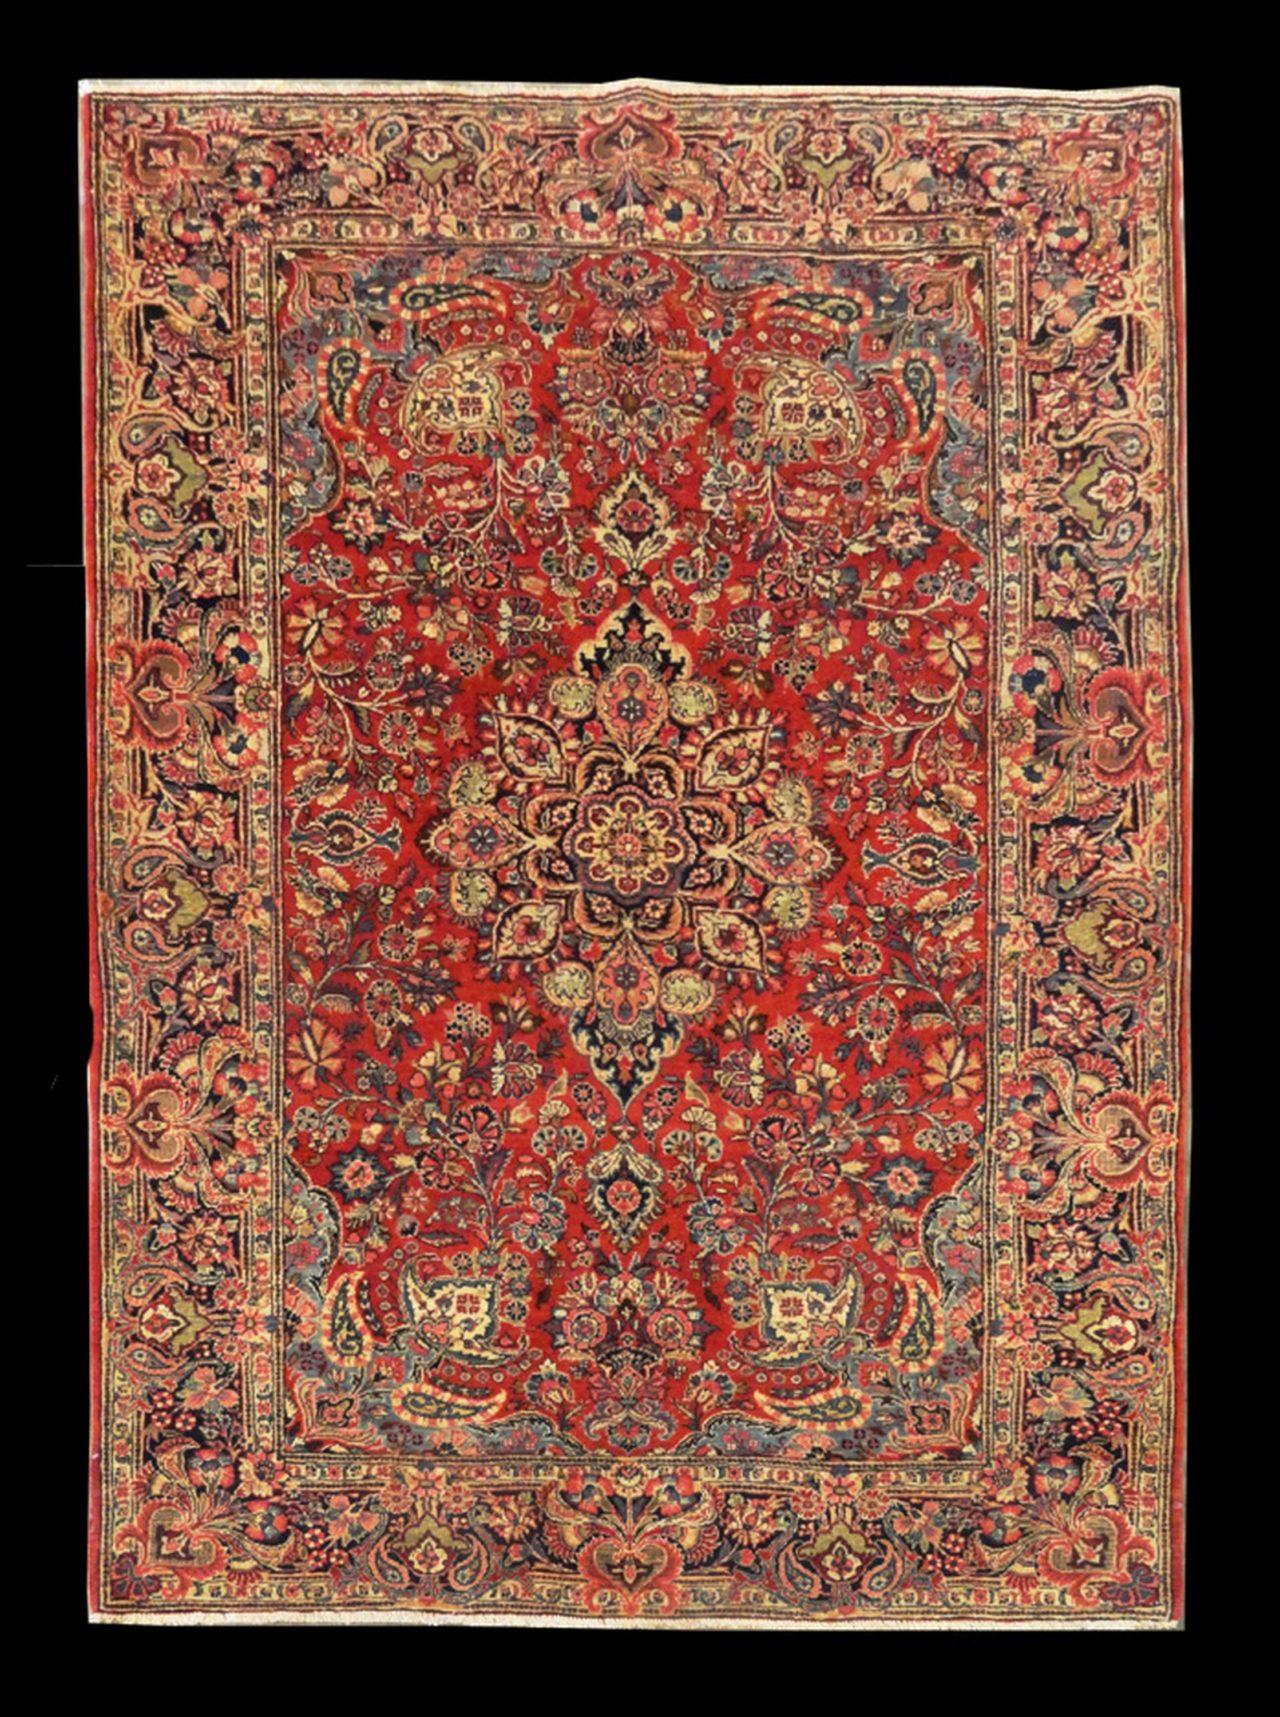 LA 106 PERSIAN BAHAR-BAFT JOSAN 6.8 x 4 (1)